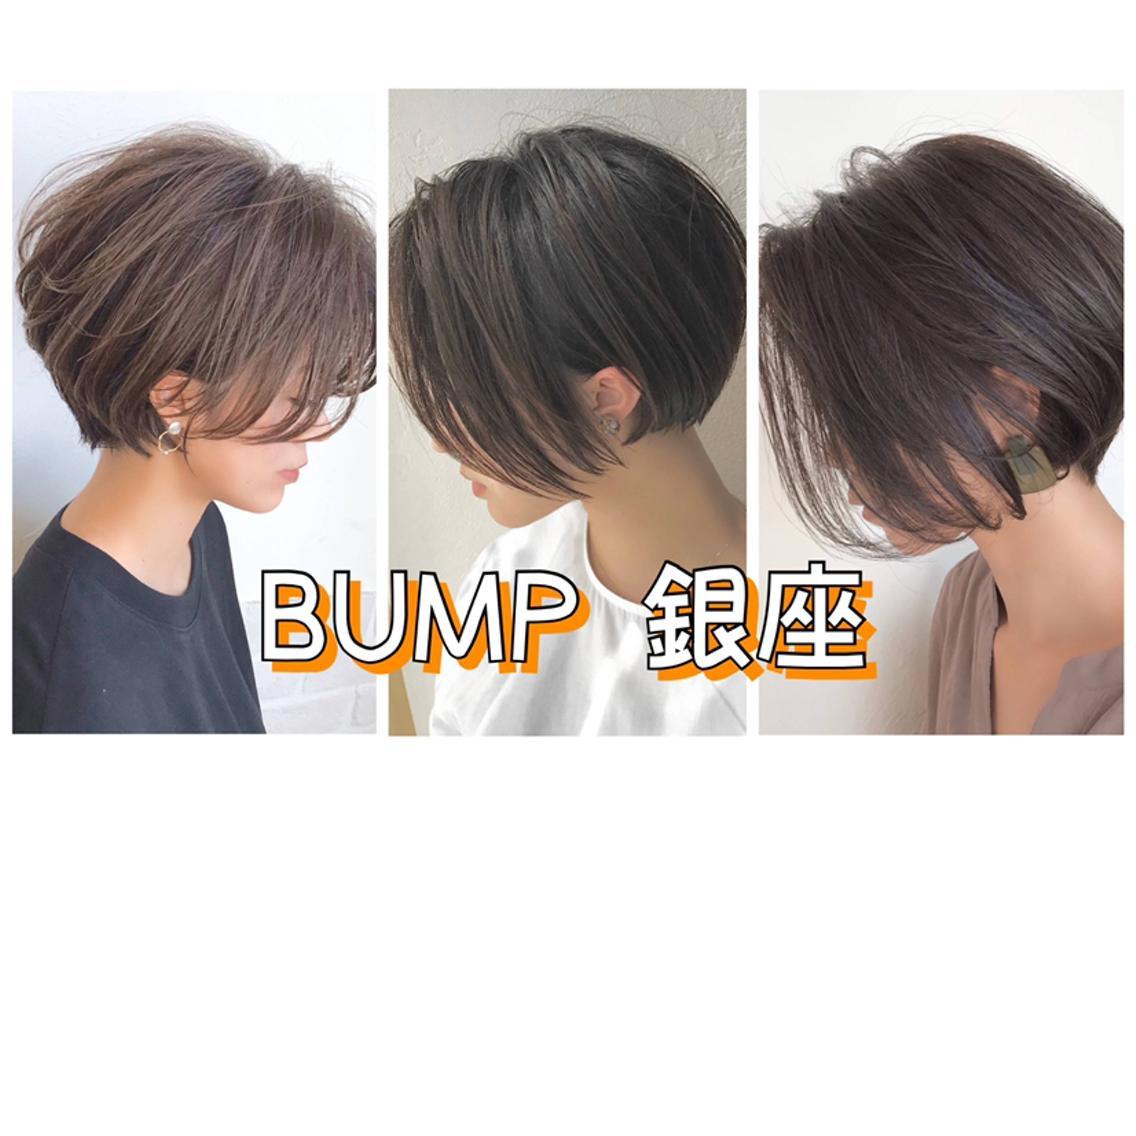 BUMP銀座所属・ショート/ボブ 西尾 翼の掲載